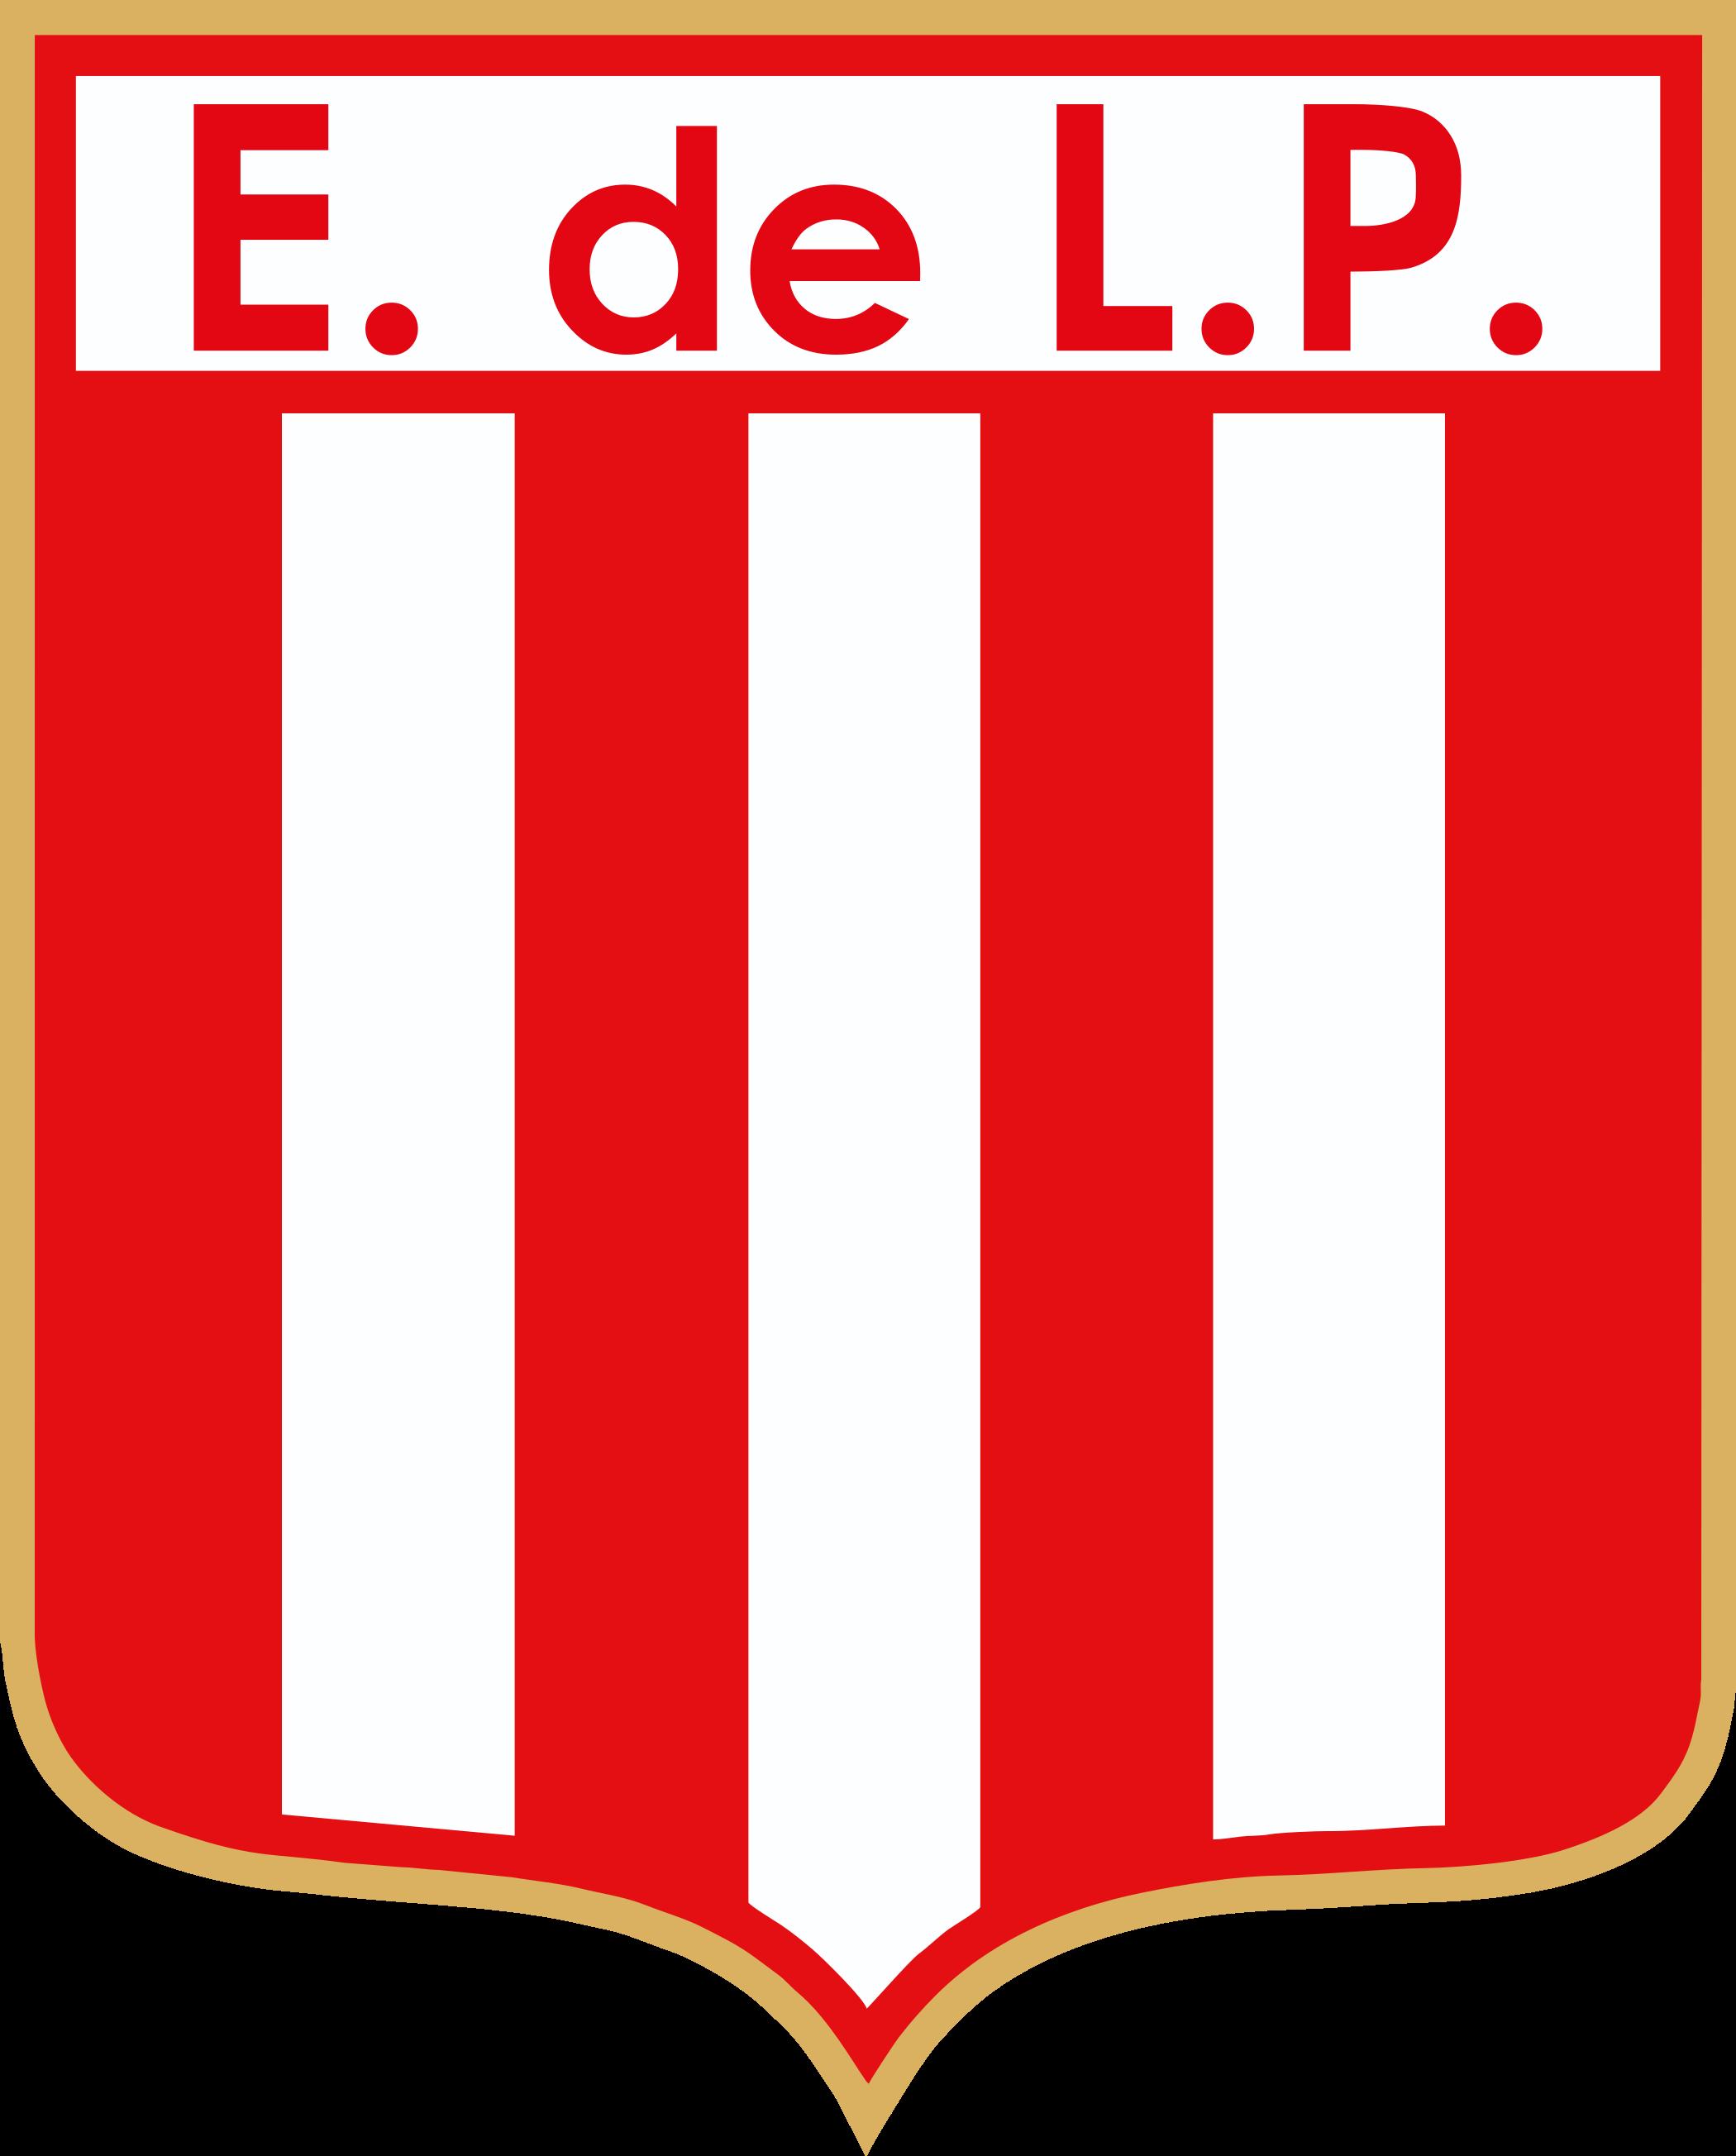 estudiantes logo escudo 2 - Estudiantes de La Plata Logo - Escudo